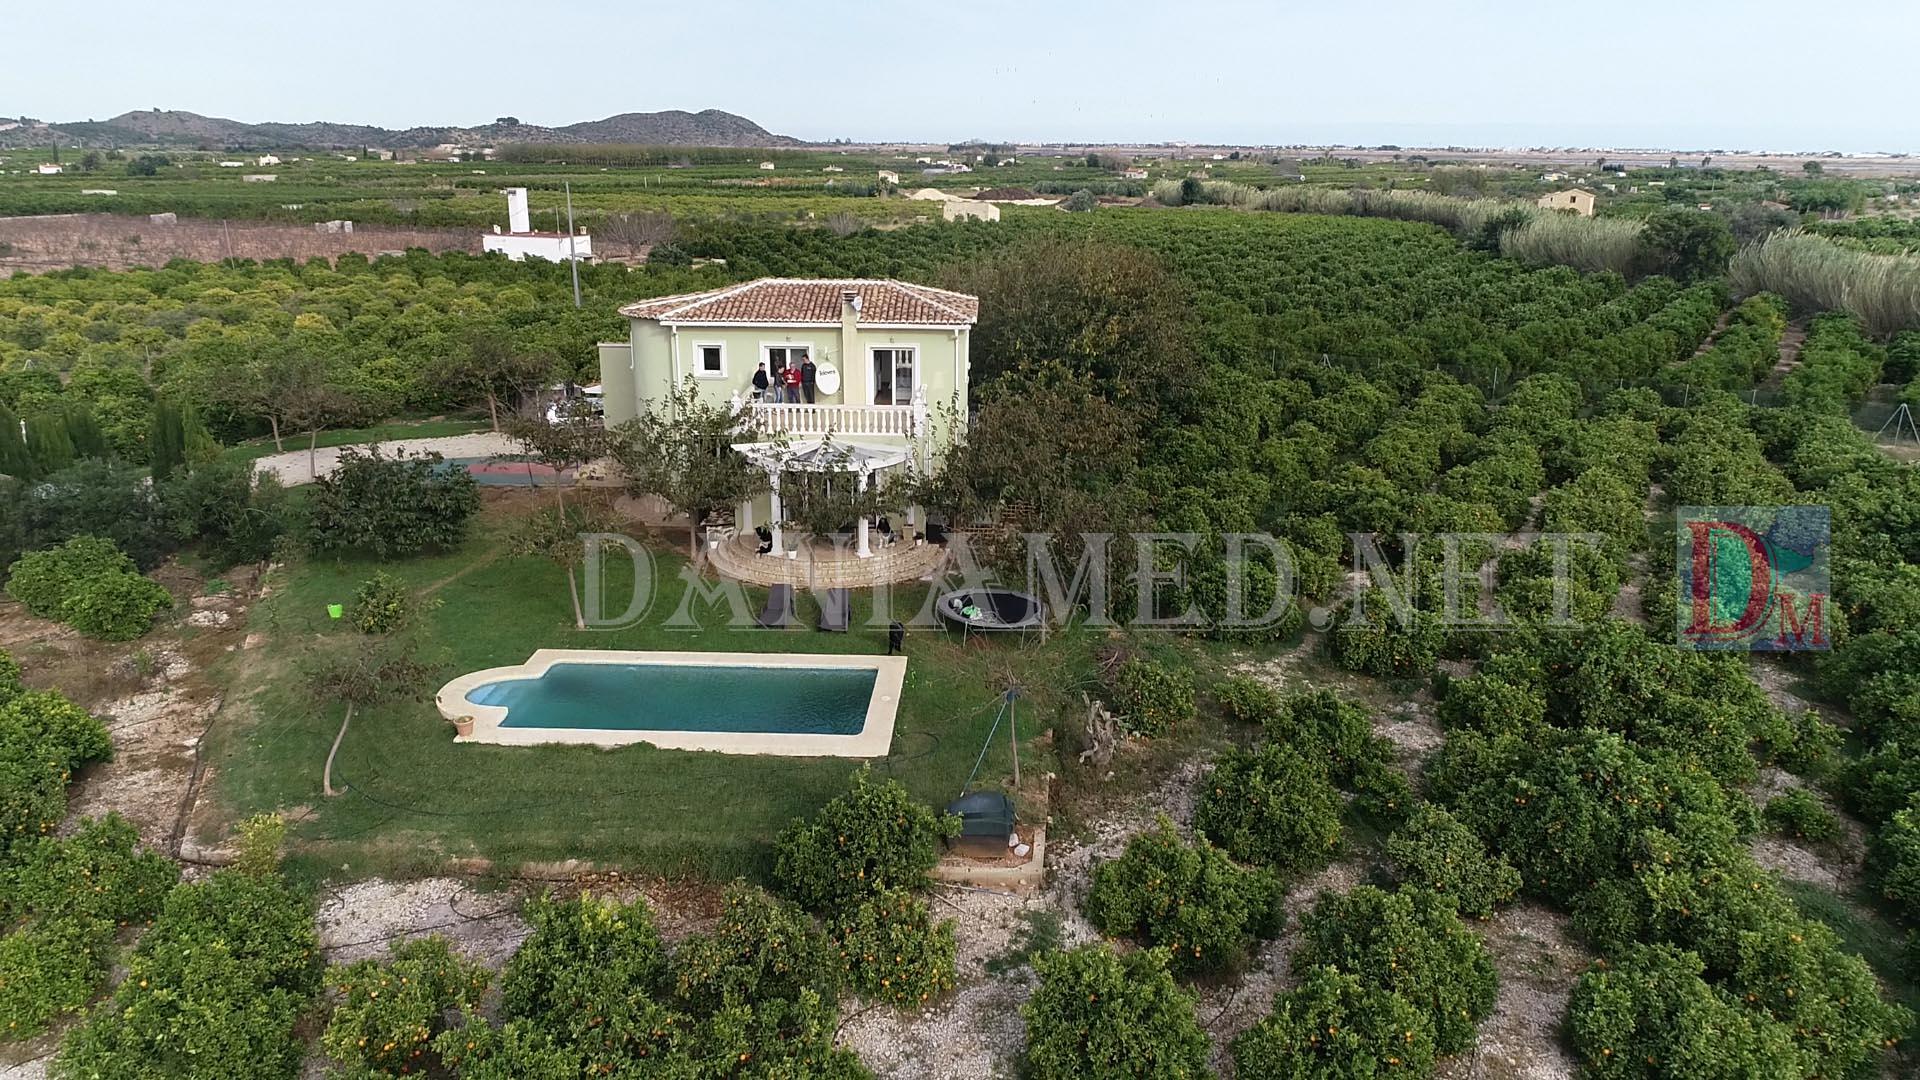 Casa  Pego - monte pego. Finca 19000m2 & chalet & piscina  !